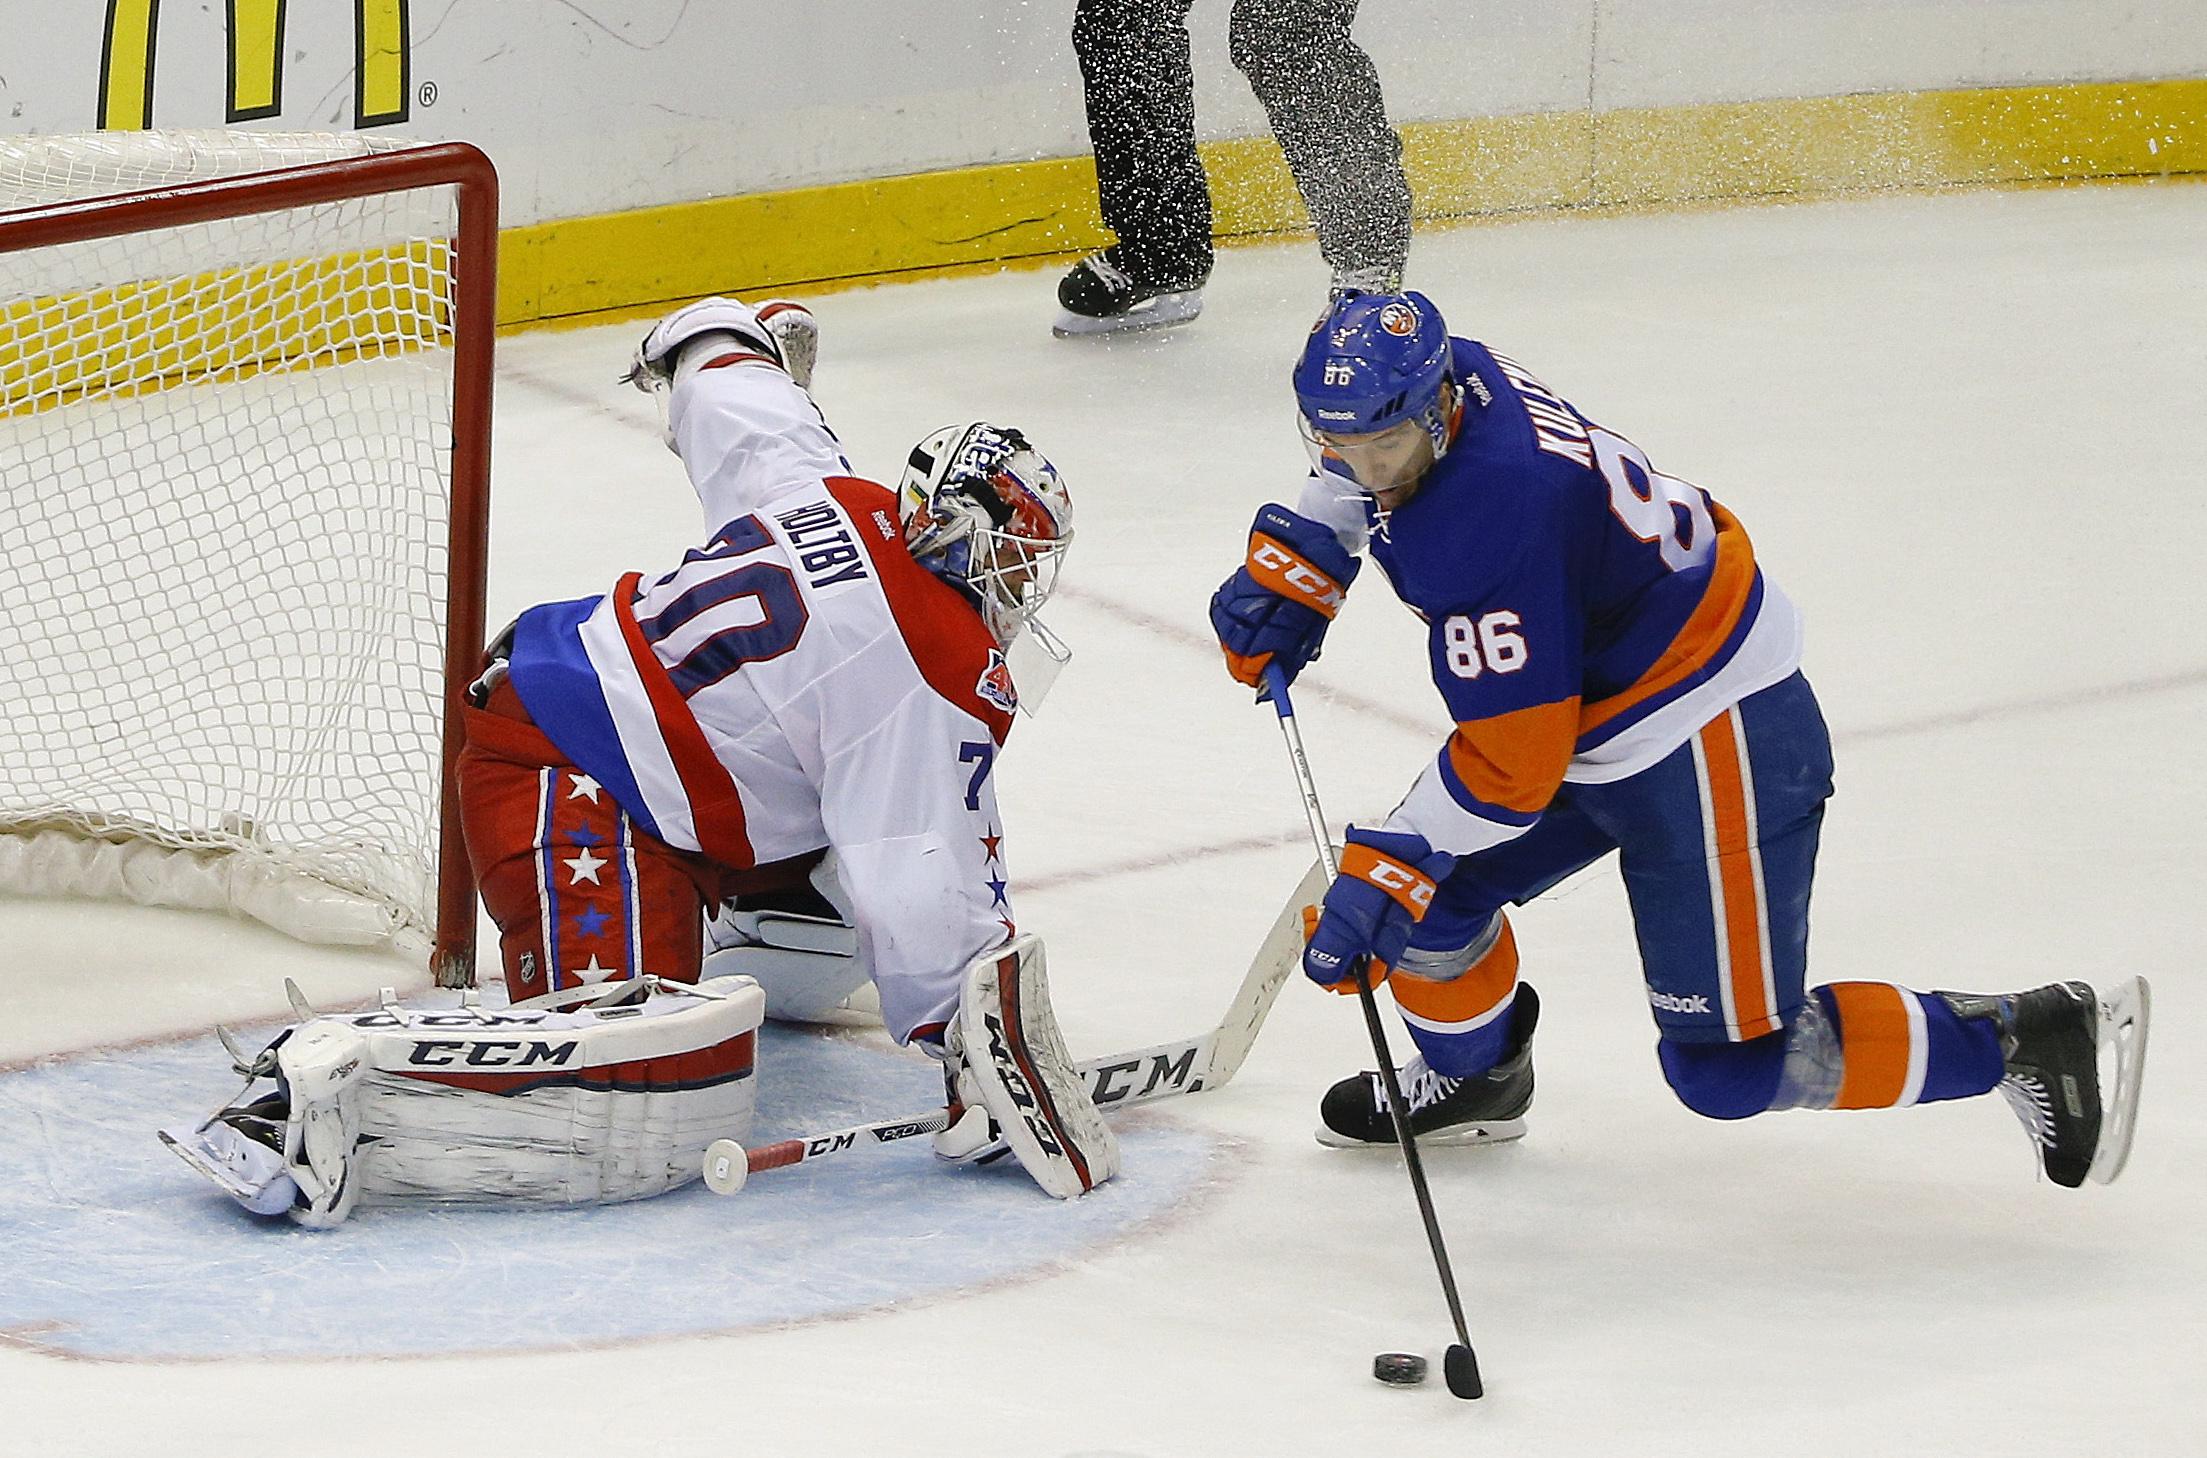 Capitals-Islanders Game 7 stirs 'Epic' memories